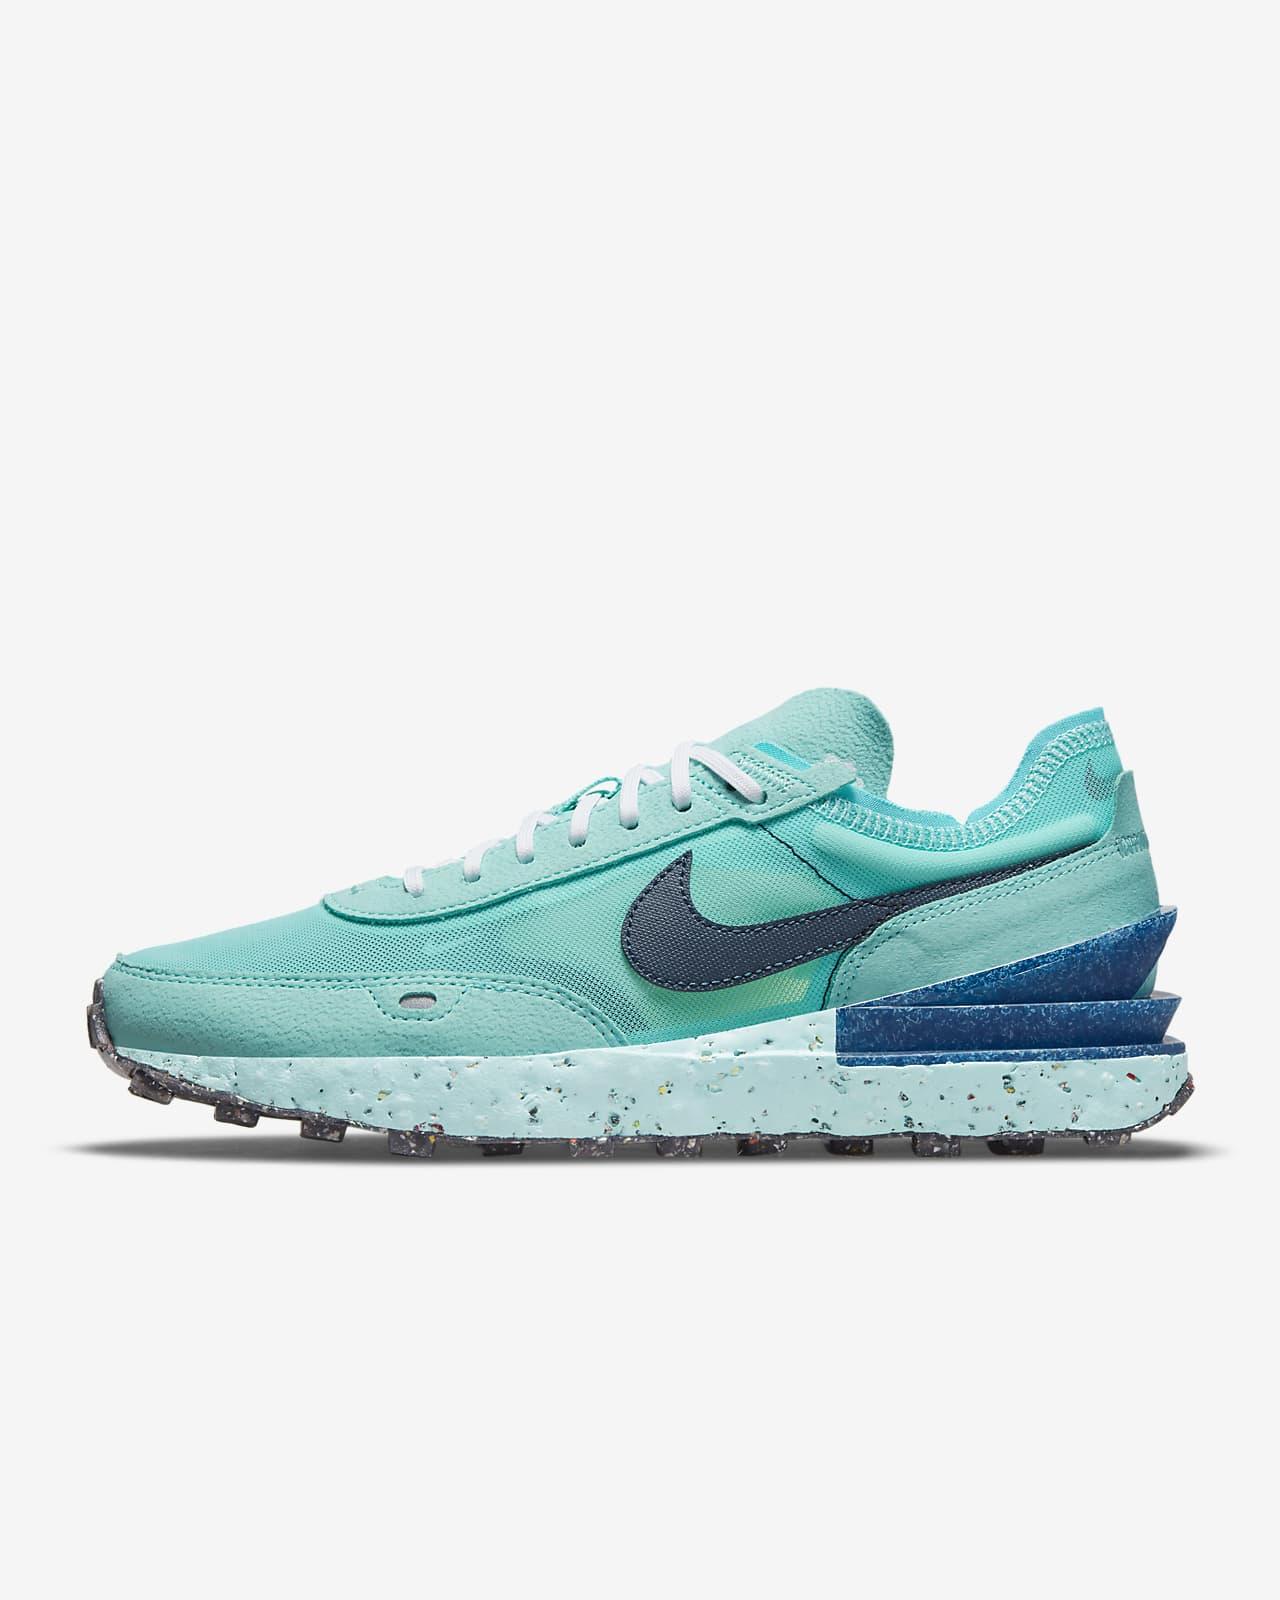 Women's Nike Waffle One Crater SE 'Dynamic Turquoise'